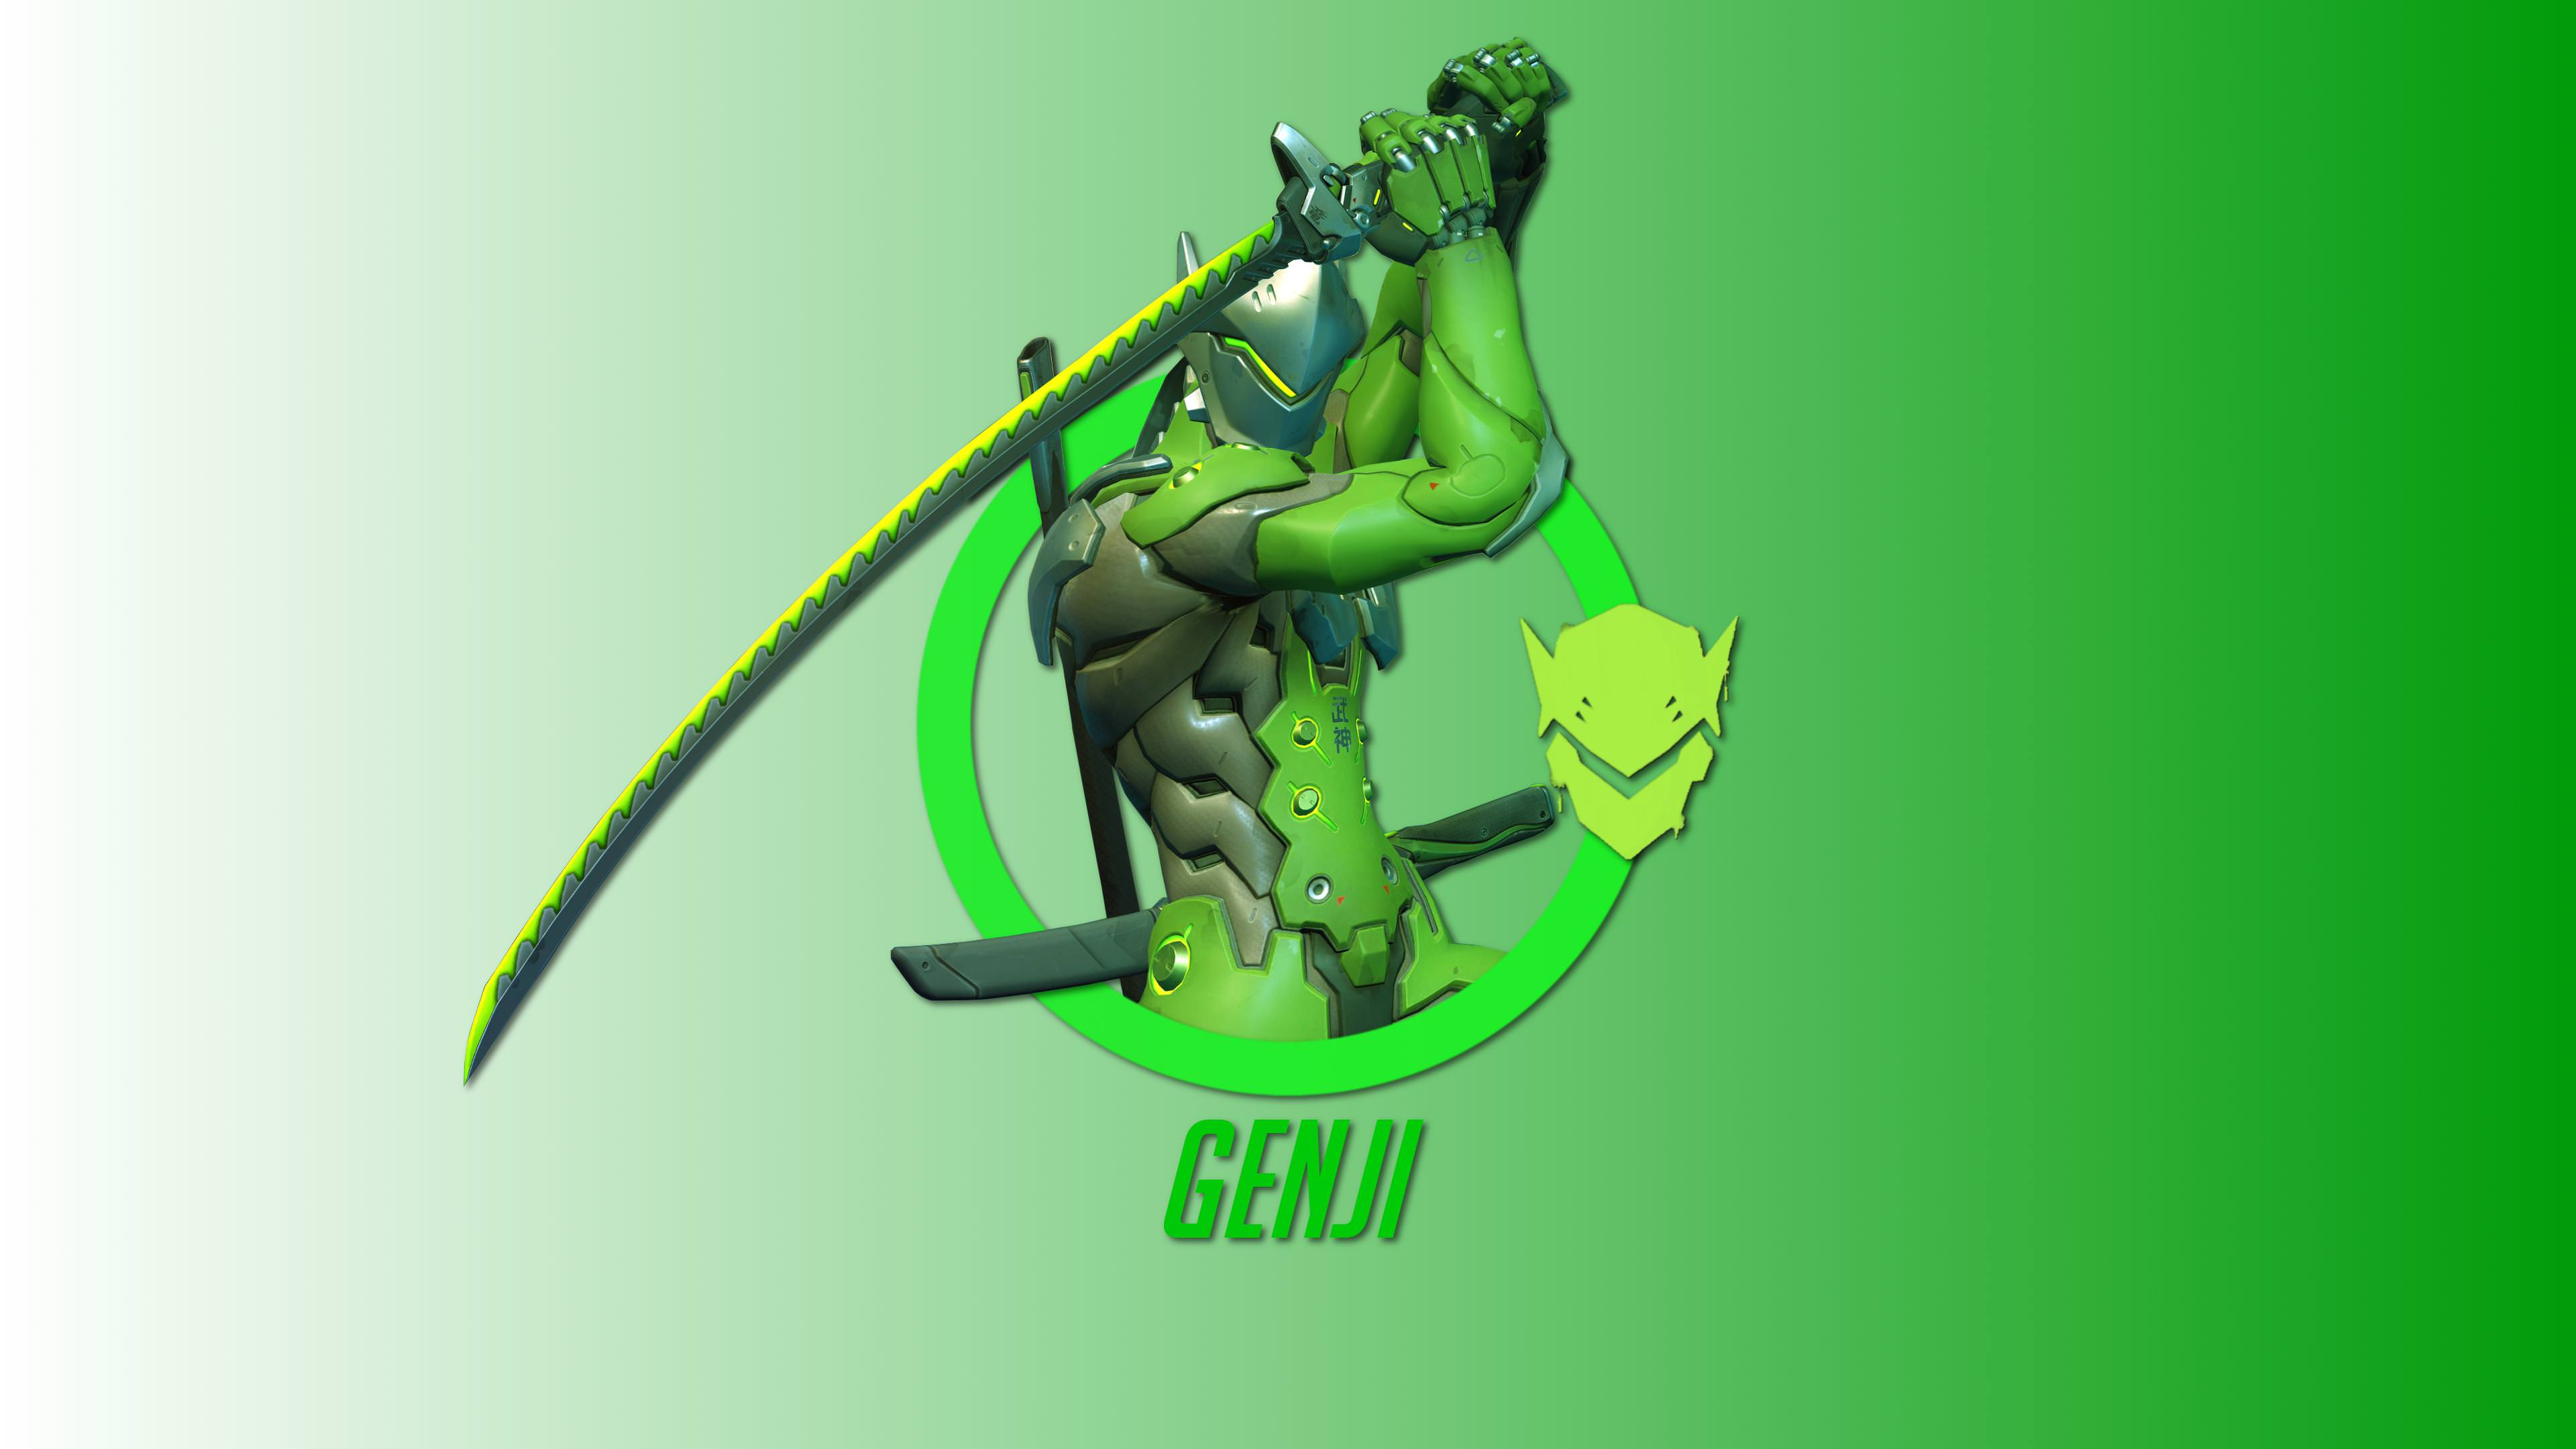 240x400 Genji Overwatch Hero 4k Acer E100huaweigalaxy S